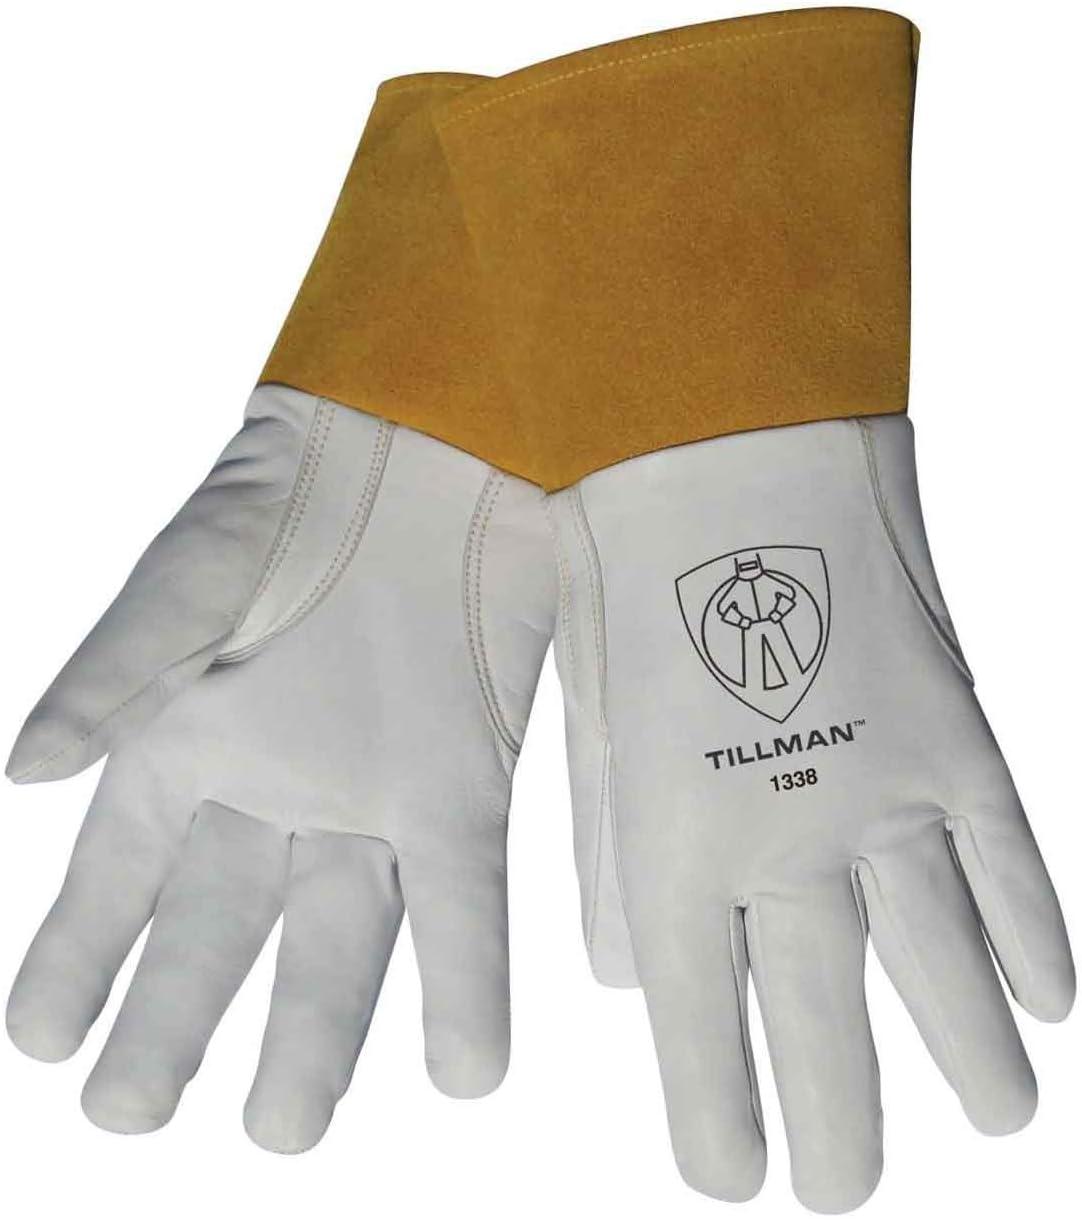 Pack of 2 - Tillman 1338 Top Grain 爆安 TIG 安い 激安 プチプラ 高品質 Gloves Goatskin w Welding